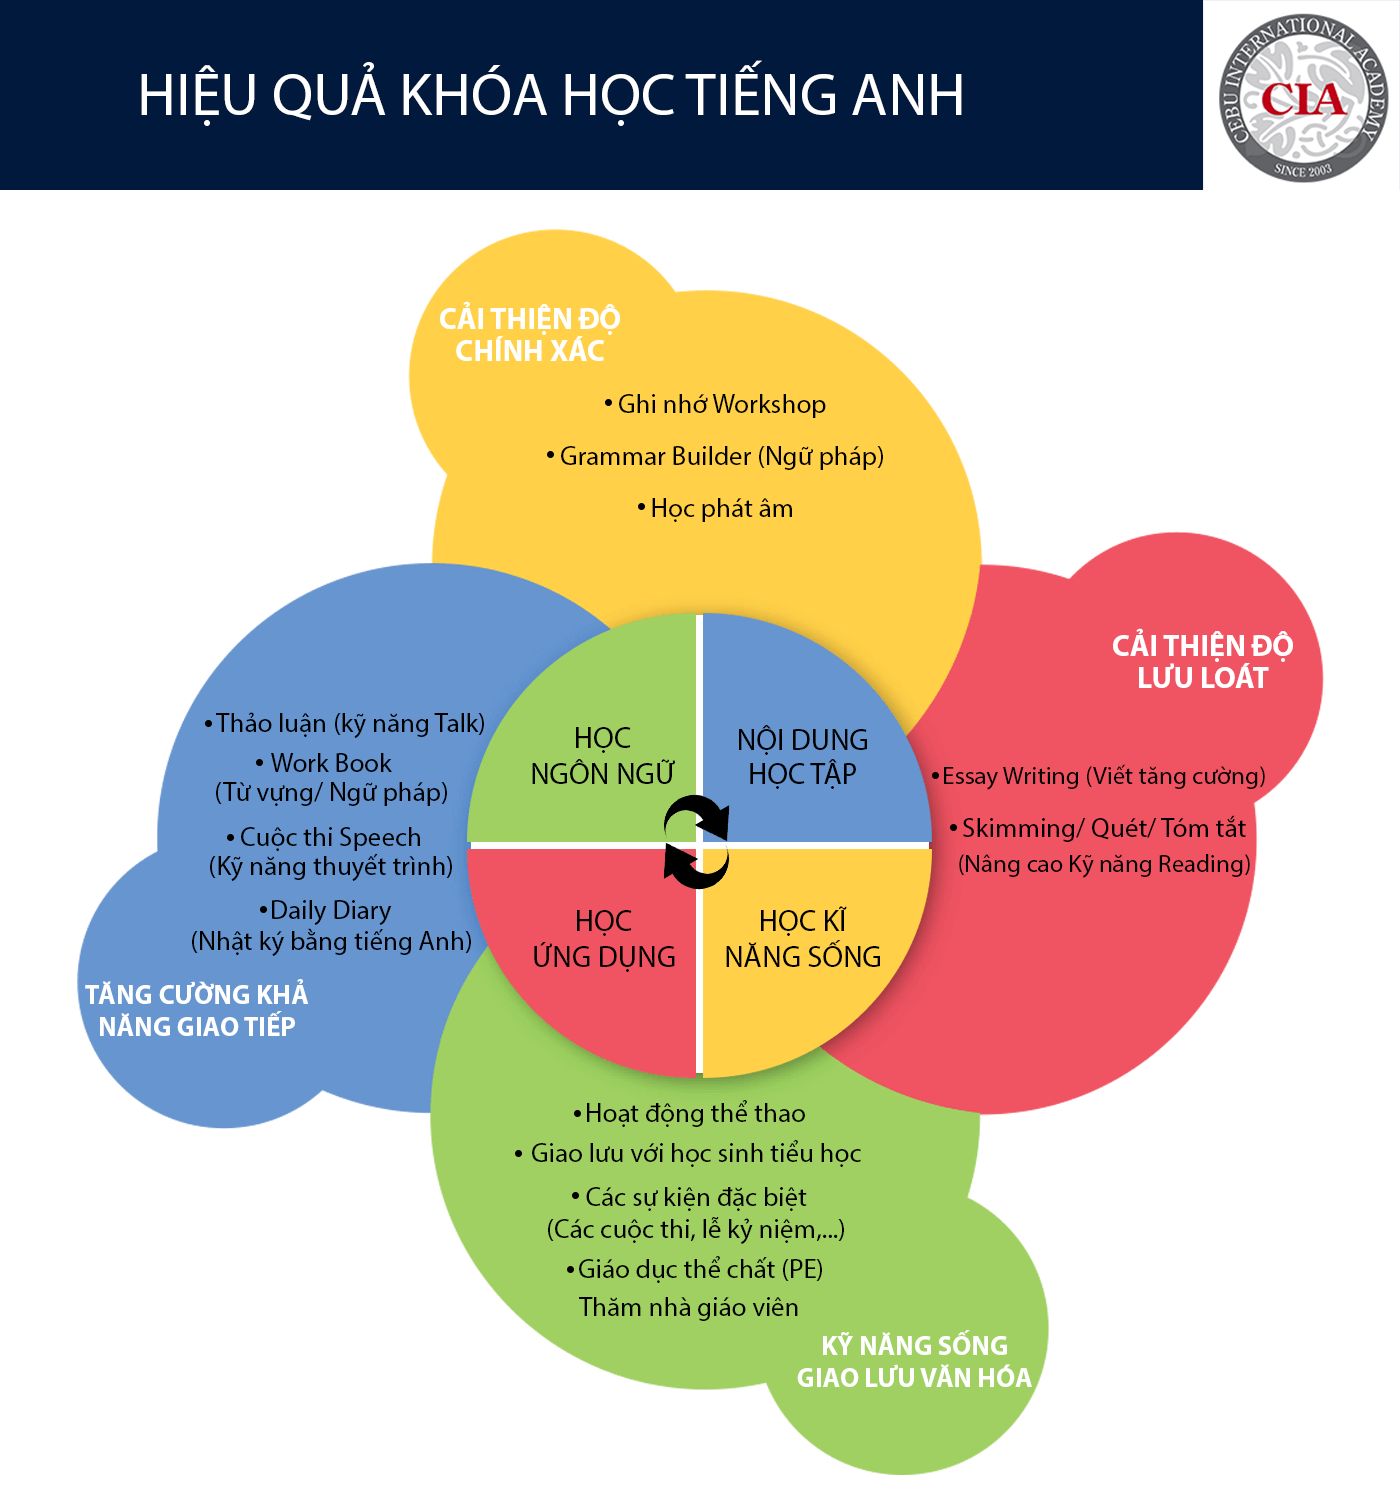 du-hoc-he-philippines-2018-tai-truong-anh-ngu-cia-2